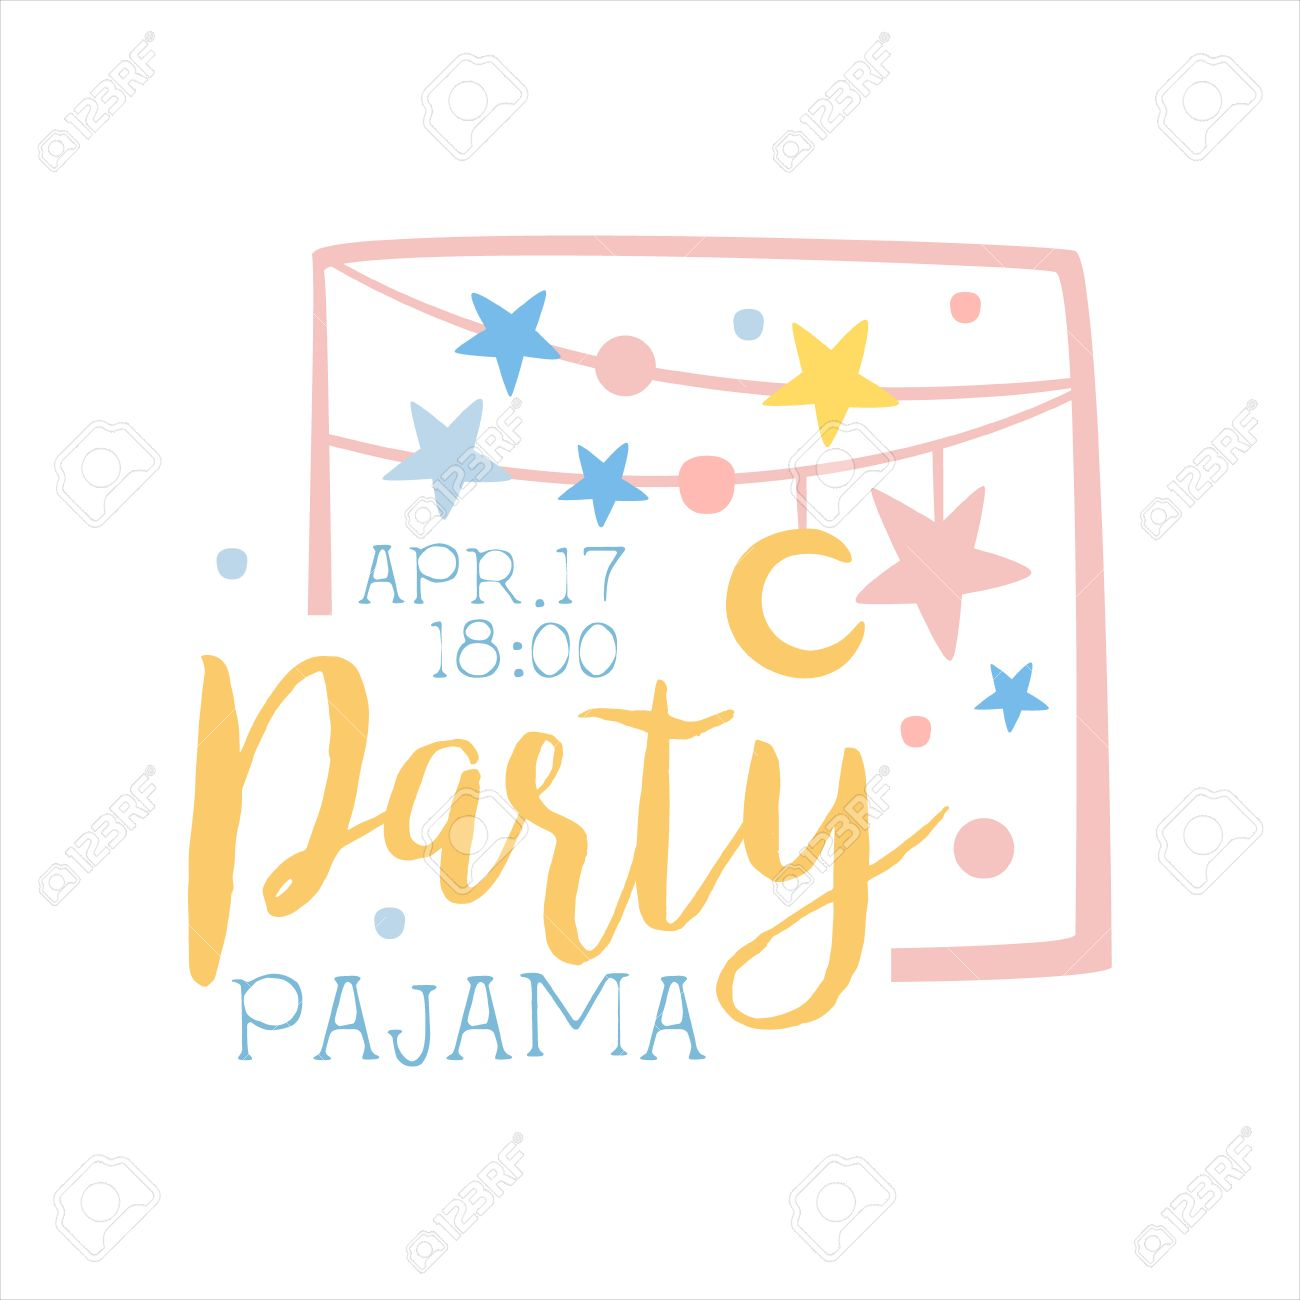 girly pajama party carte d invitation modele avec guirlandes invitant kids for the sleepover nuit slumber pyjama stencil pour la carte postale